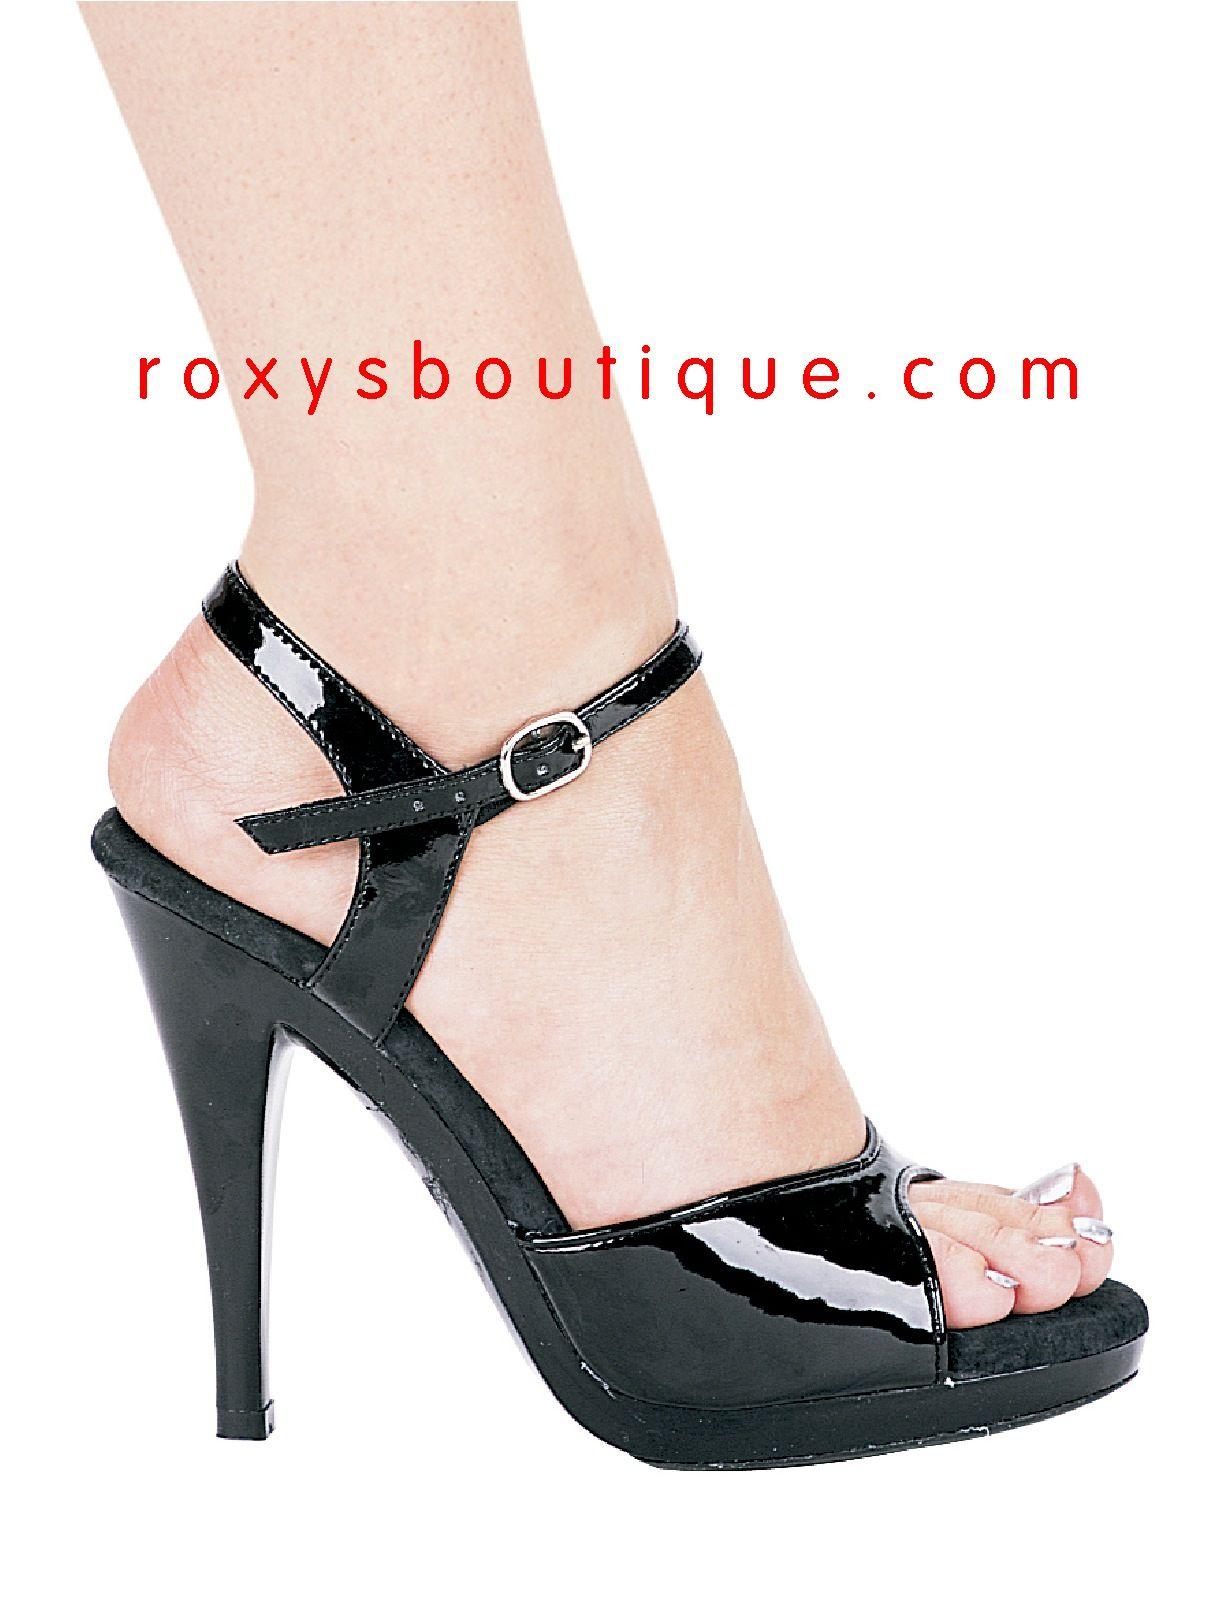 Black sandals 2 inch heel - Black Patent Sandals With 4 1 2 Inch Heels Brand Ellie Shoes Medium B